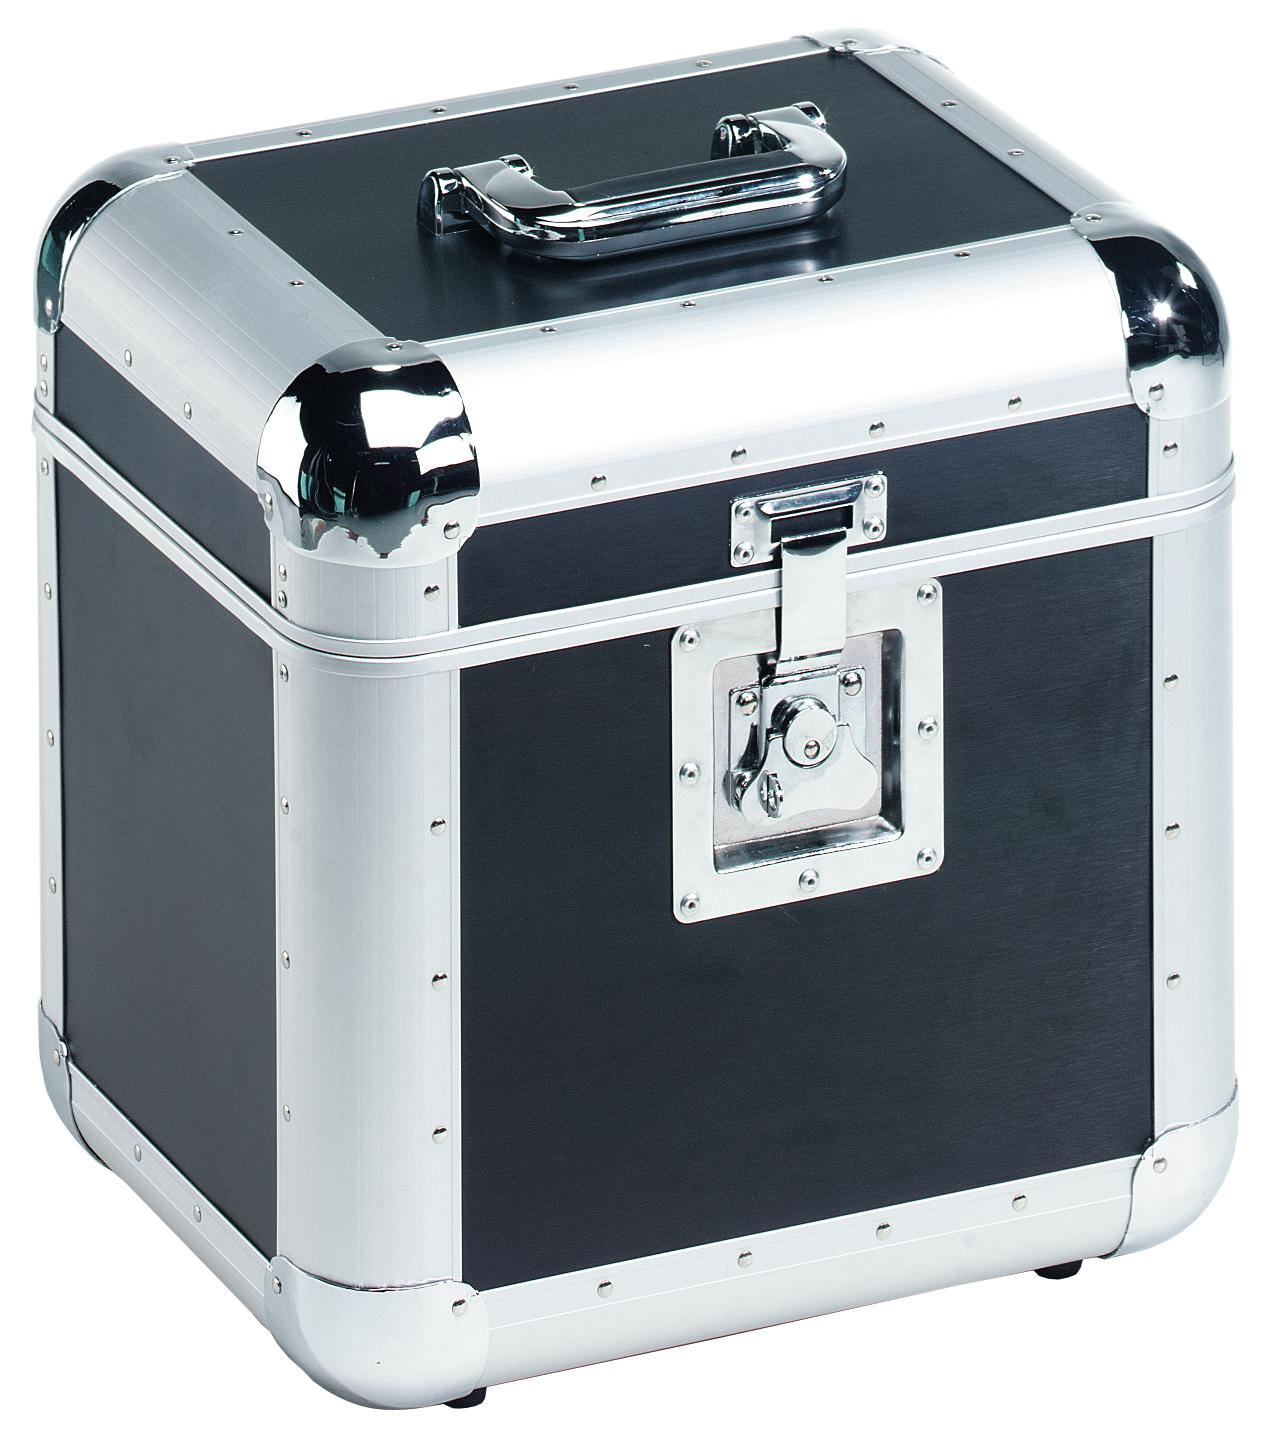 ROADINGER Platten-Case ALU 75/25 abgerundet, sw